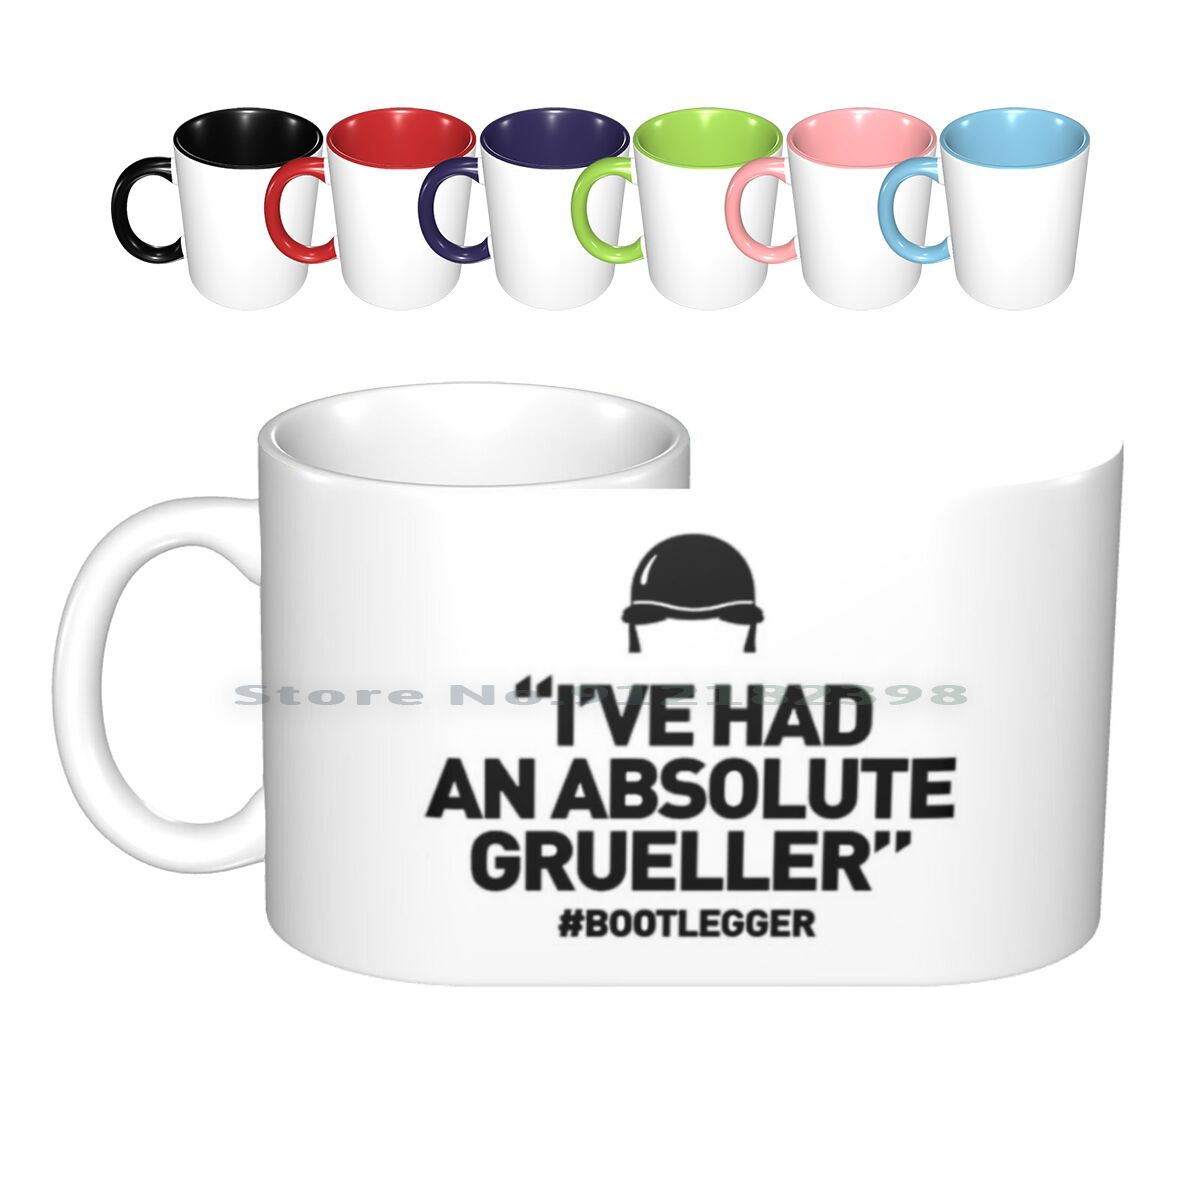 Bootlegger-I've Had An Absolute Grueller Ceramic Mugs Coffee Cups Milk Tea Mug Bootlegger Wrexham Afc Wales Beer Lager Cider